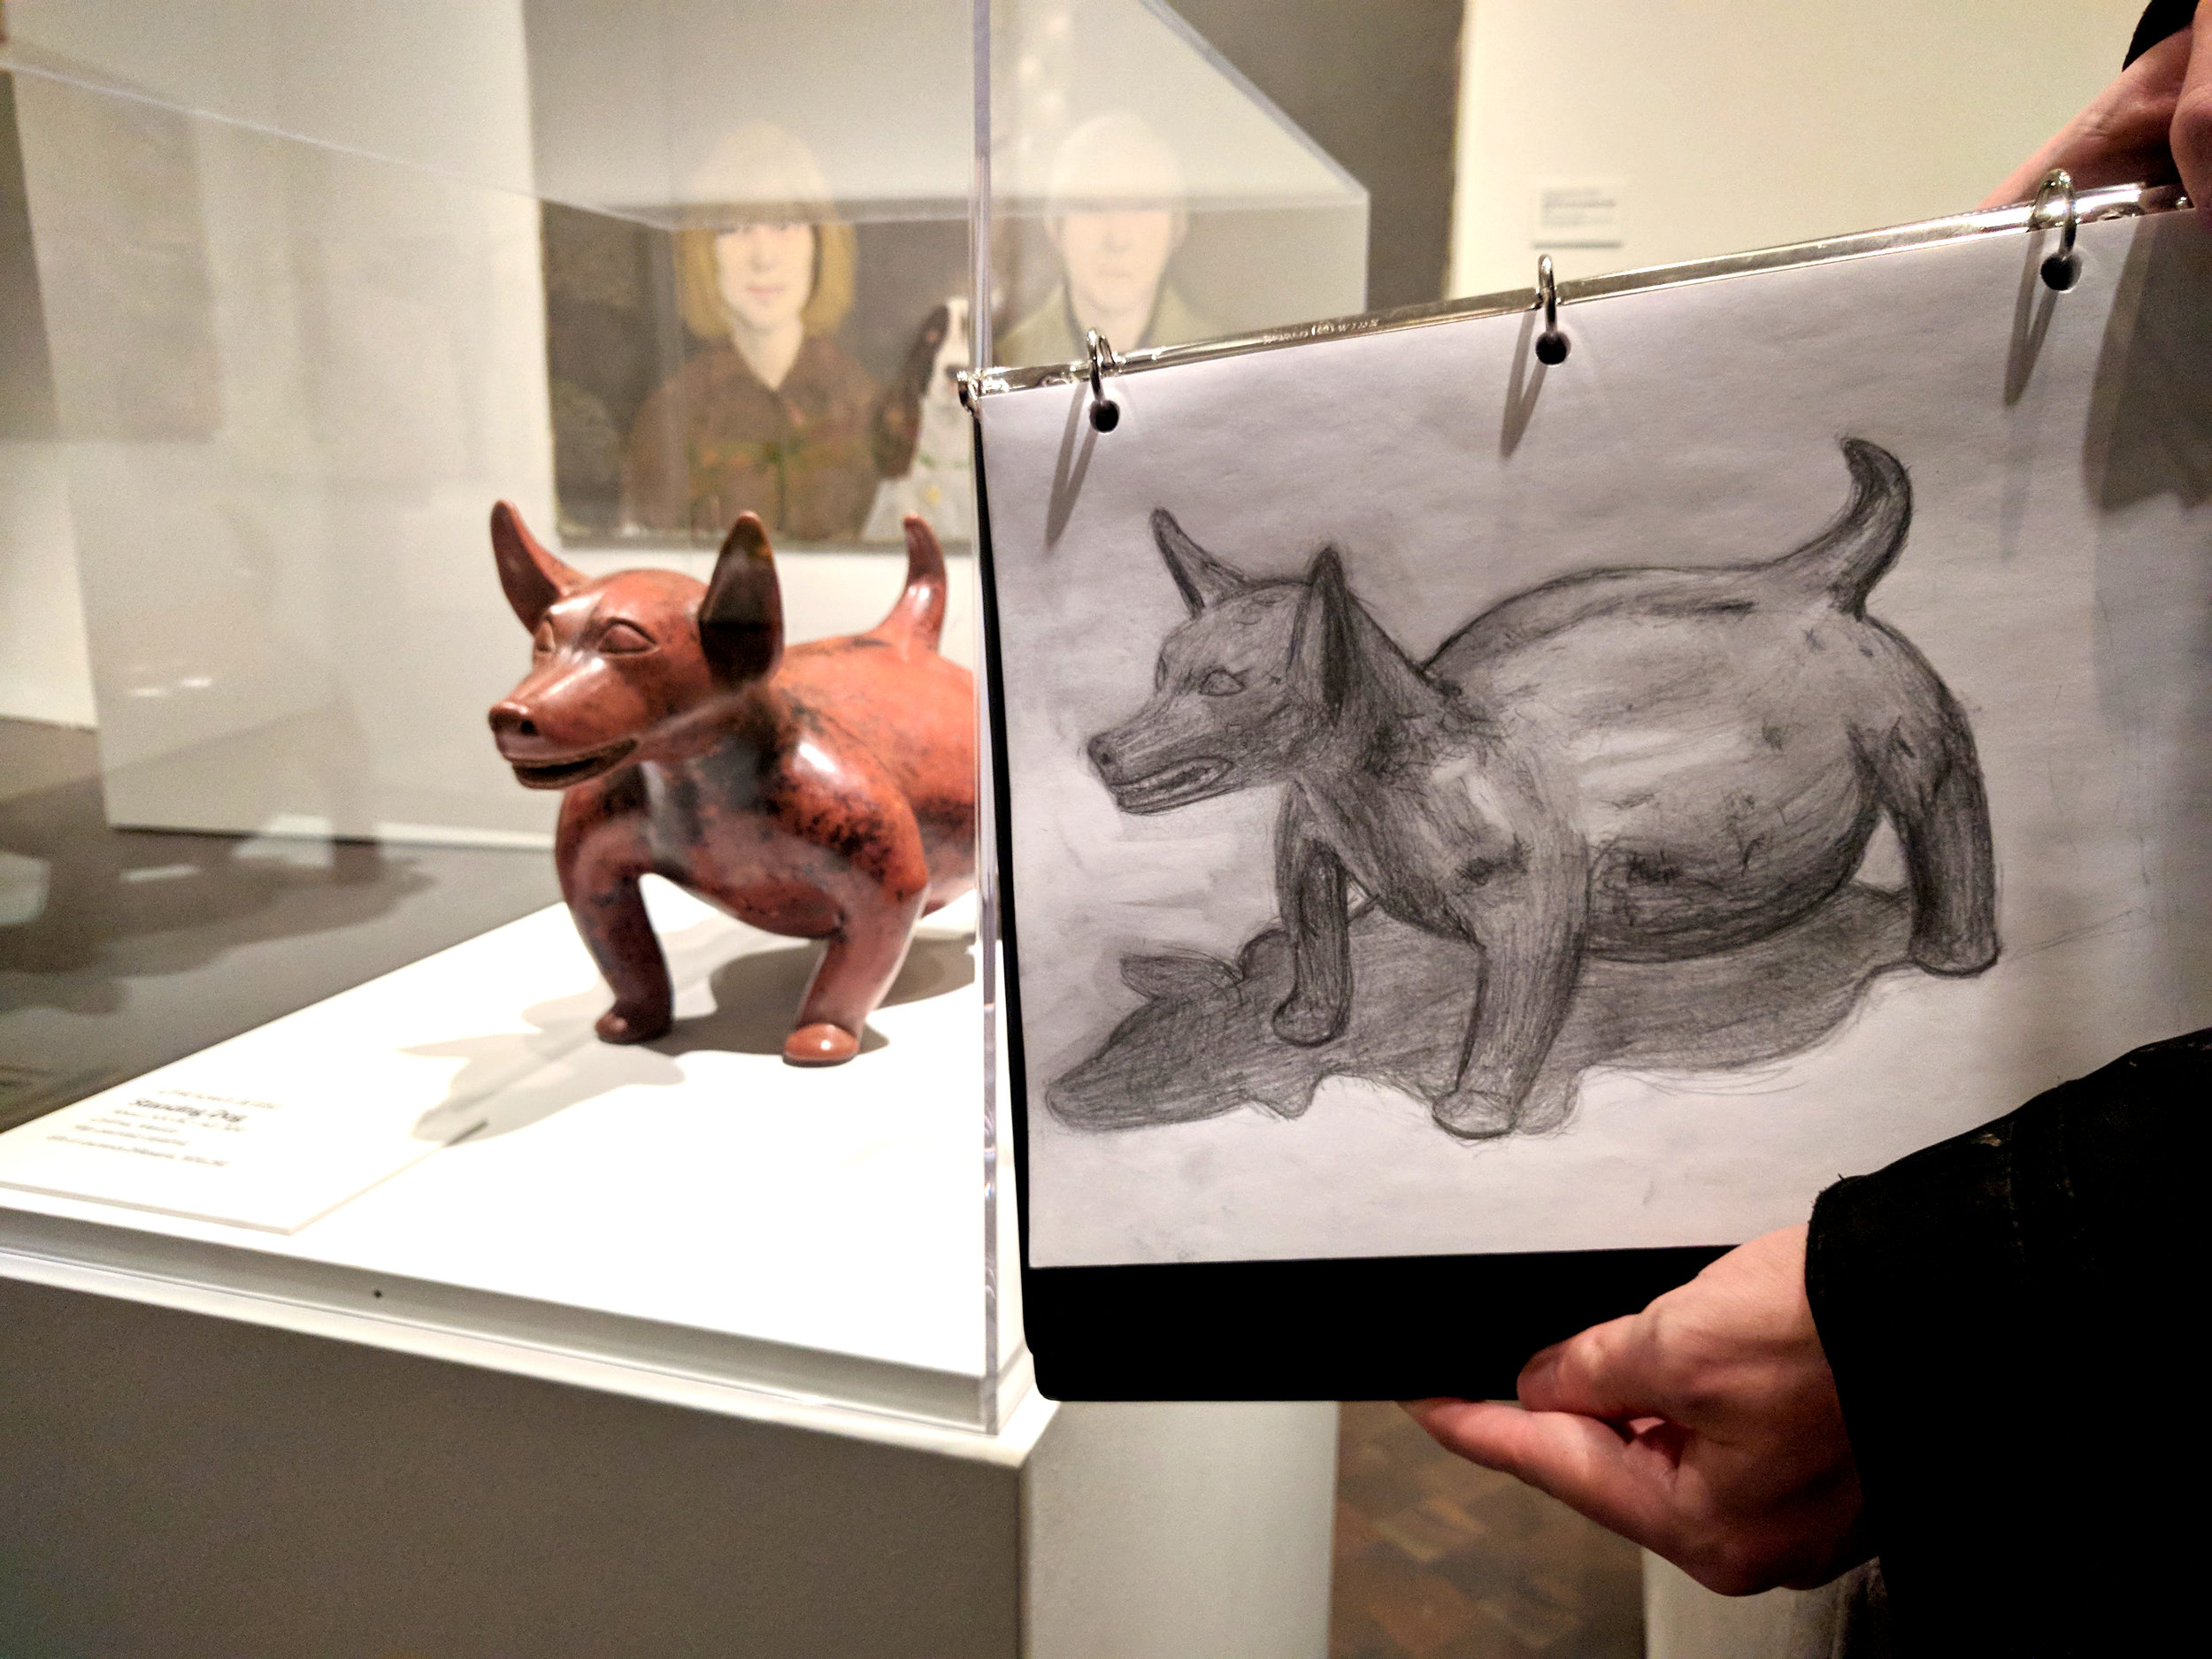 William Wise, graphite on paper